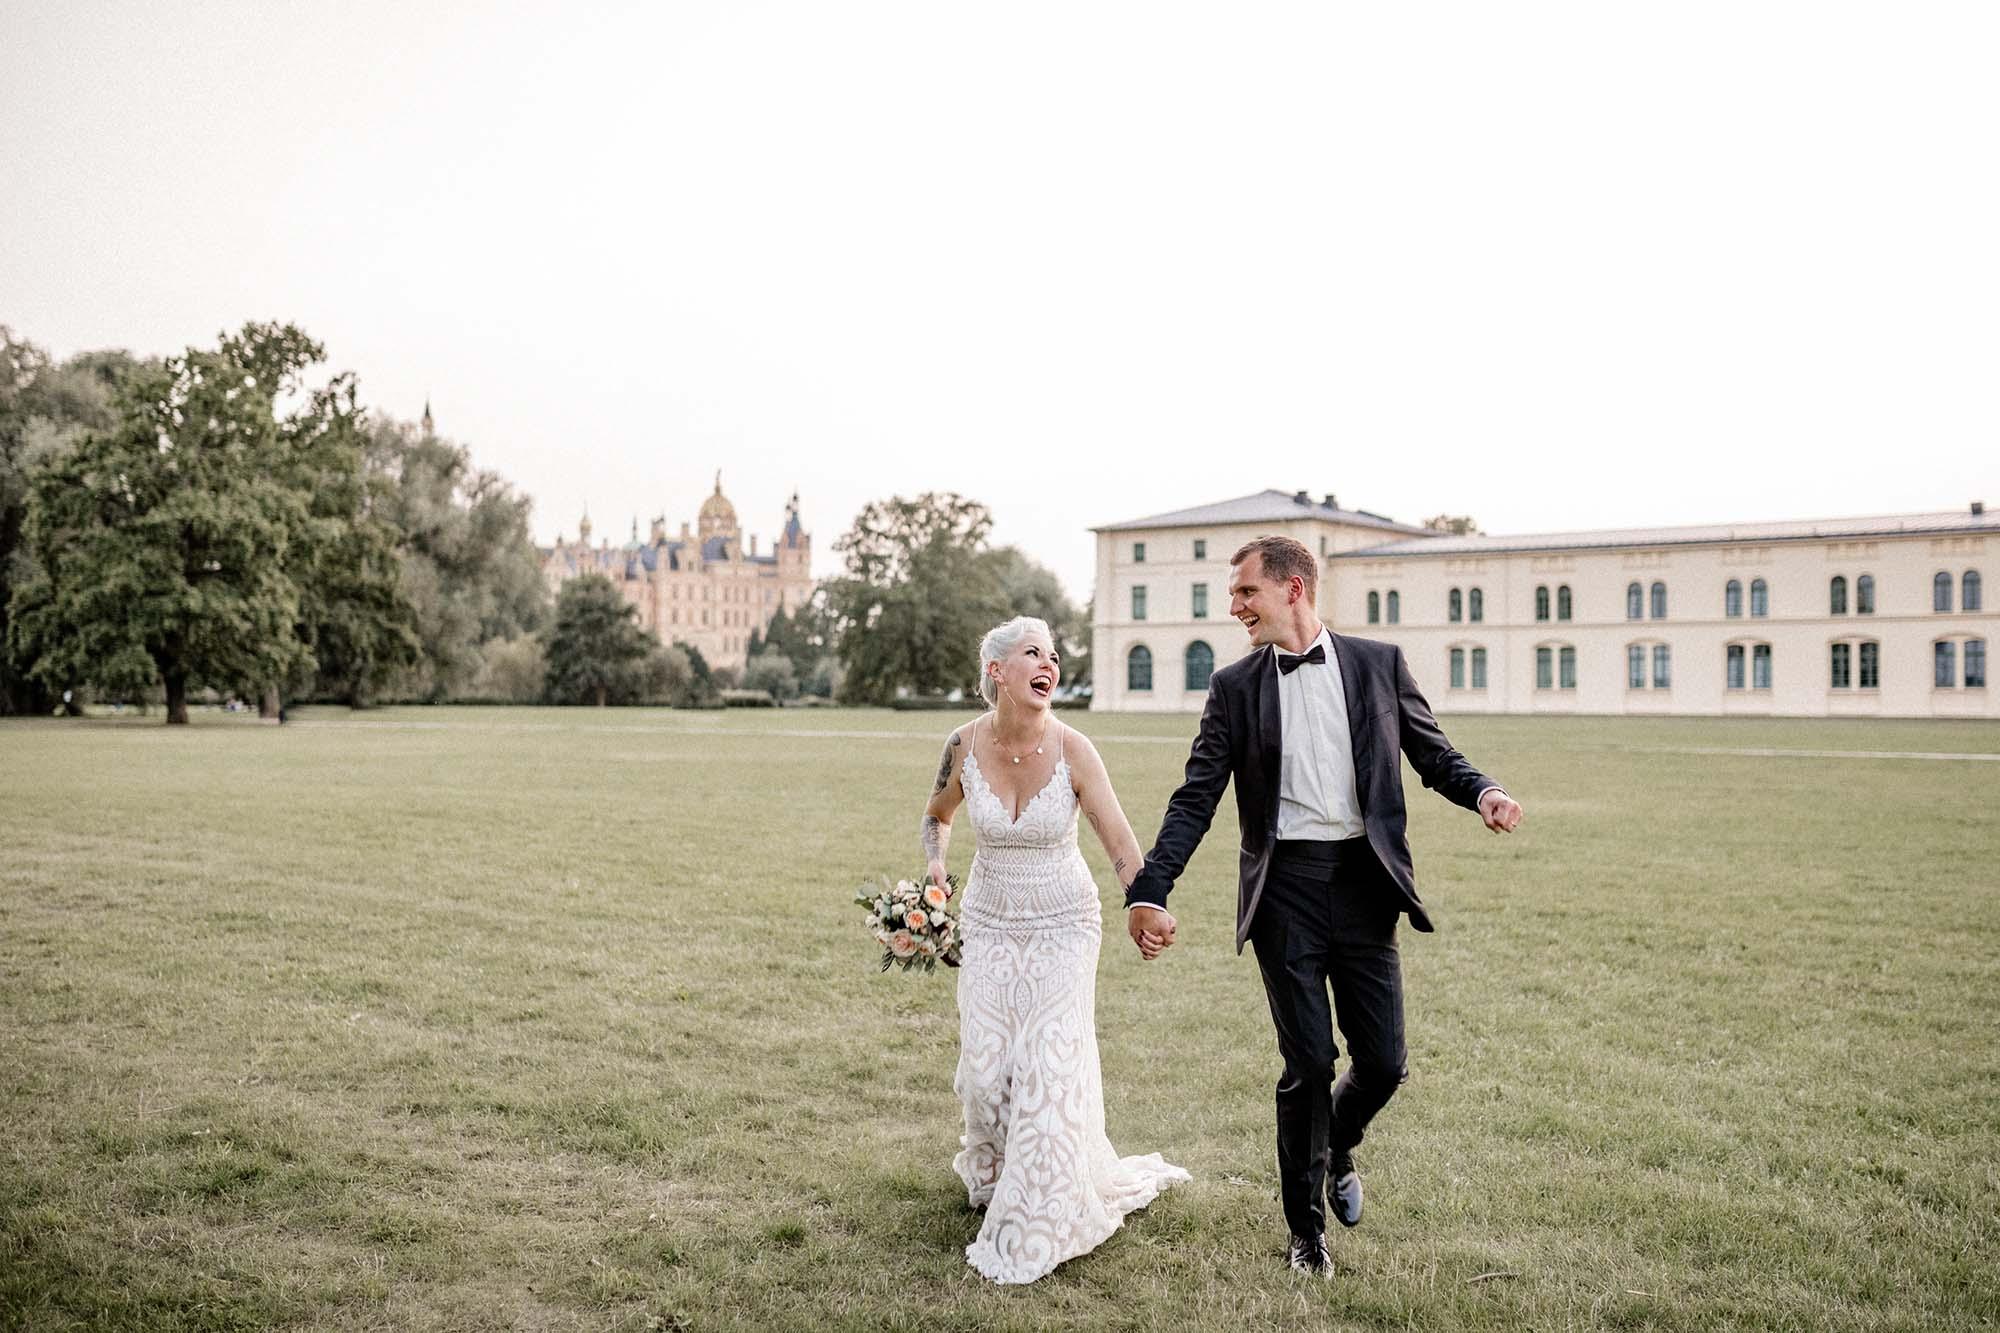 Virginia Pech Fotografie Hochzeitsfotograf Hochzeitsfotografie Hochzeitsfotos Schwerin Schloss Seglerheim Schelfkirche 212